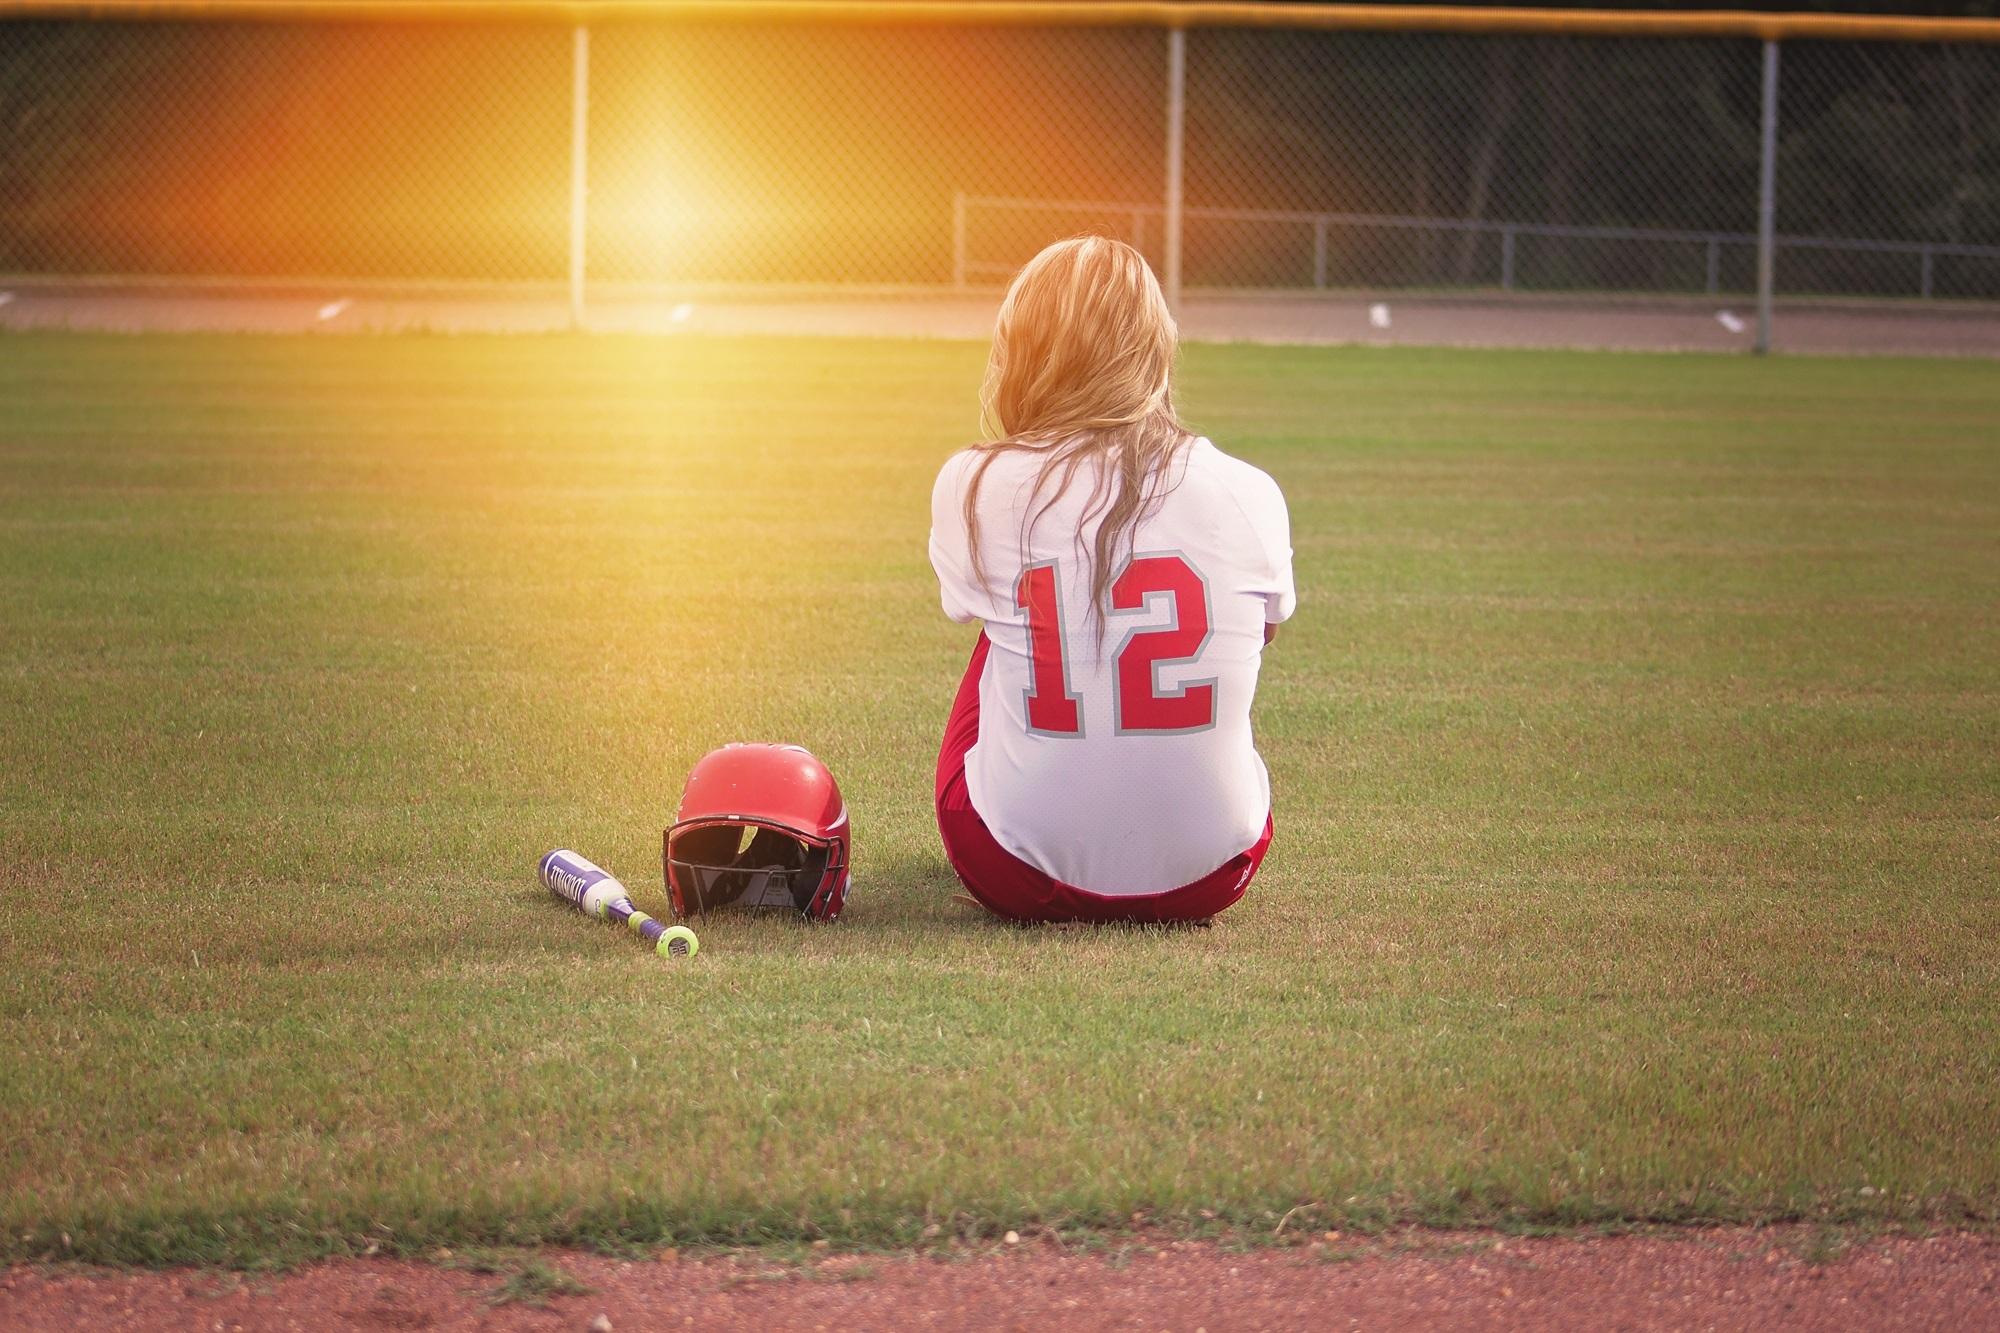 softball-player-girl-bat-163287.jpg